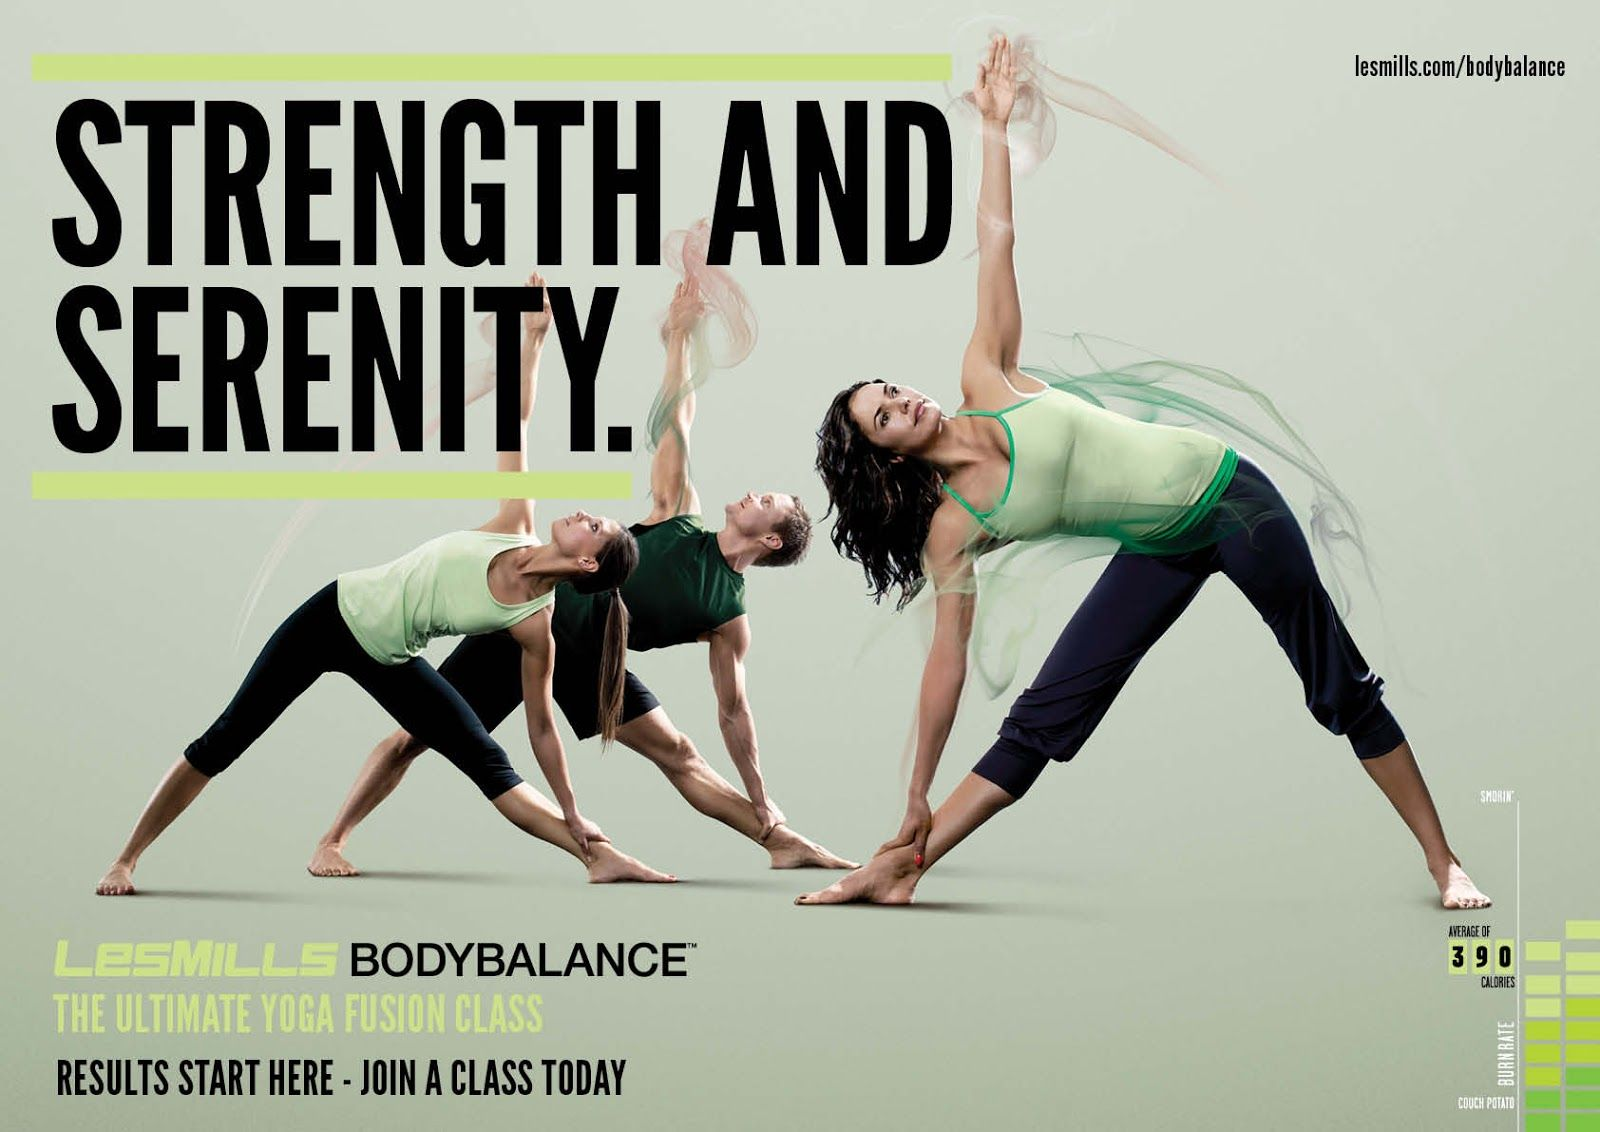 Bodybalance En Termaria Lesmills Holistic Health Coach Workout Programs Group Fitness